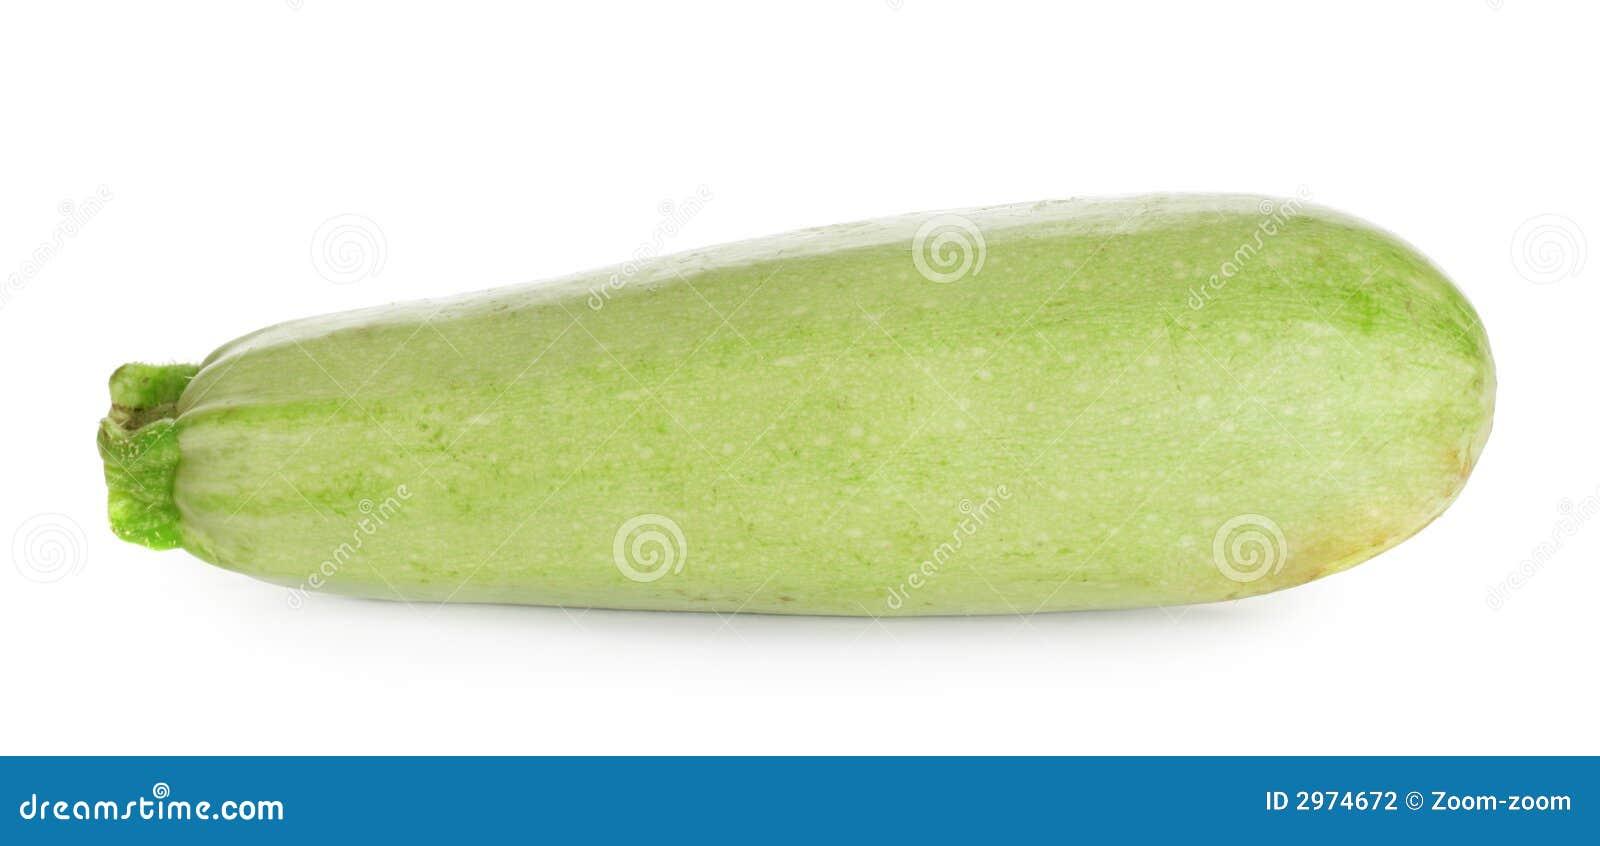 Vegetable Marrow Stock Photography - Image: 2974672